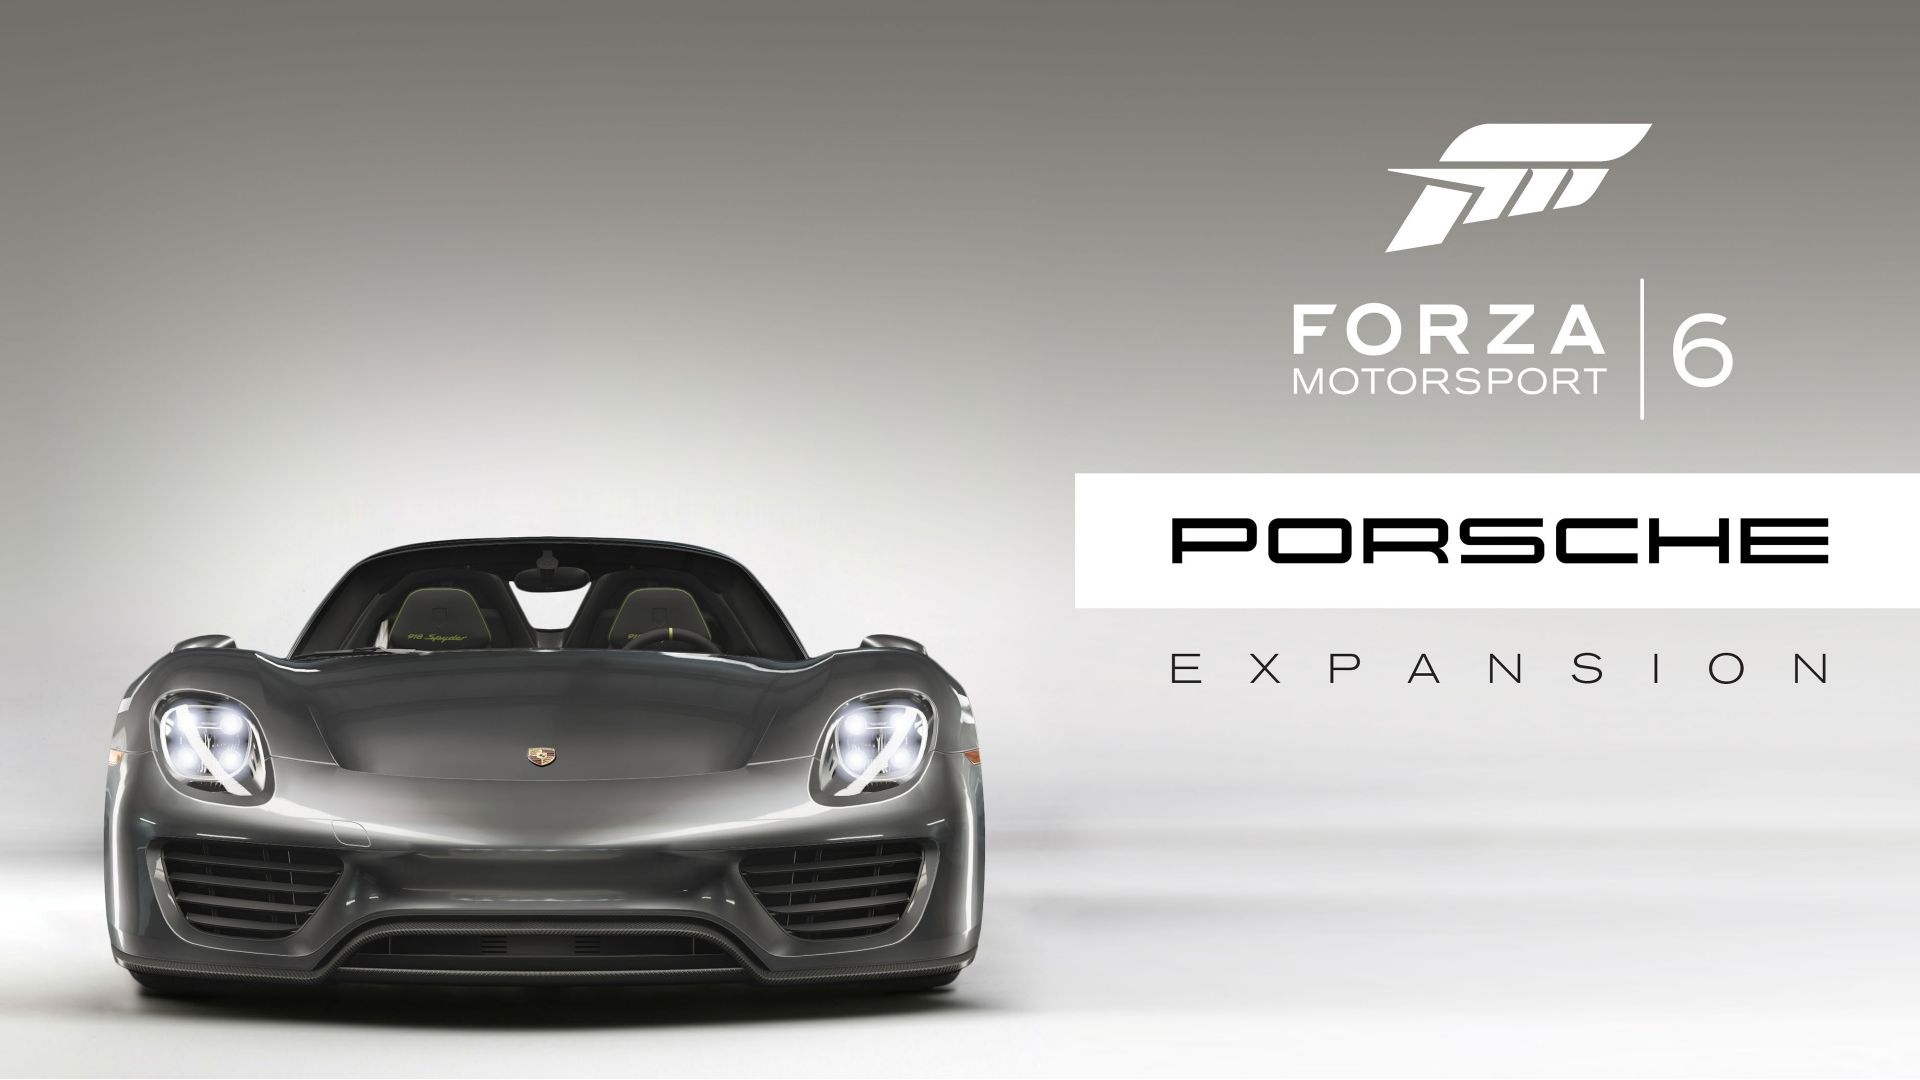 wallpaper forza motorsport 6 apex porsche expansion best games sport cars racing concept. Black Bedroom Furniture Sets. Home Design Ideas